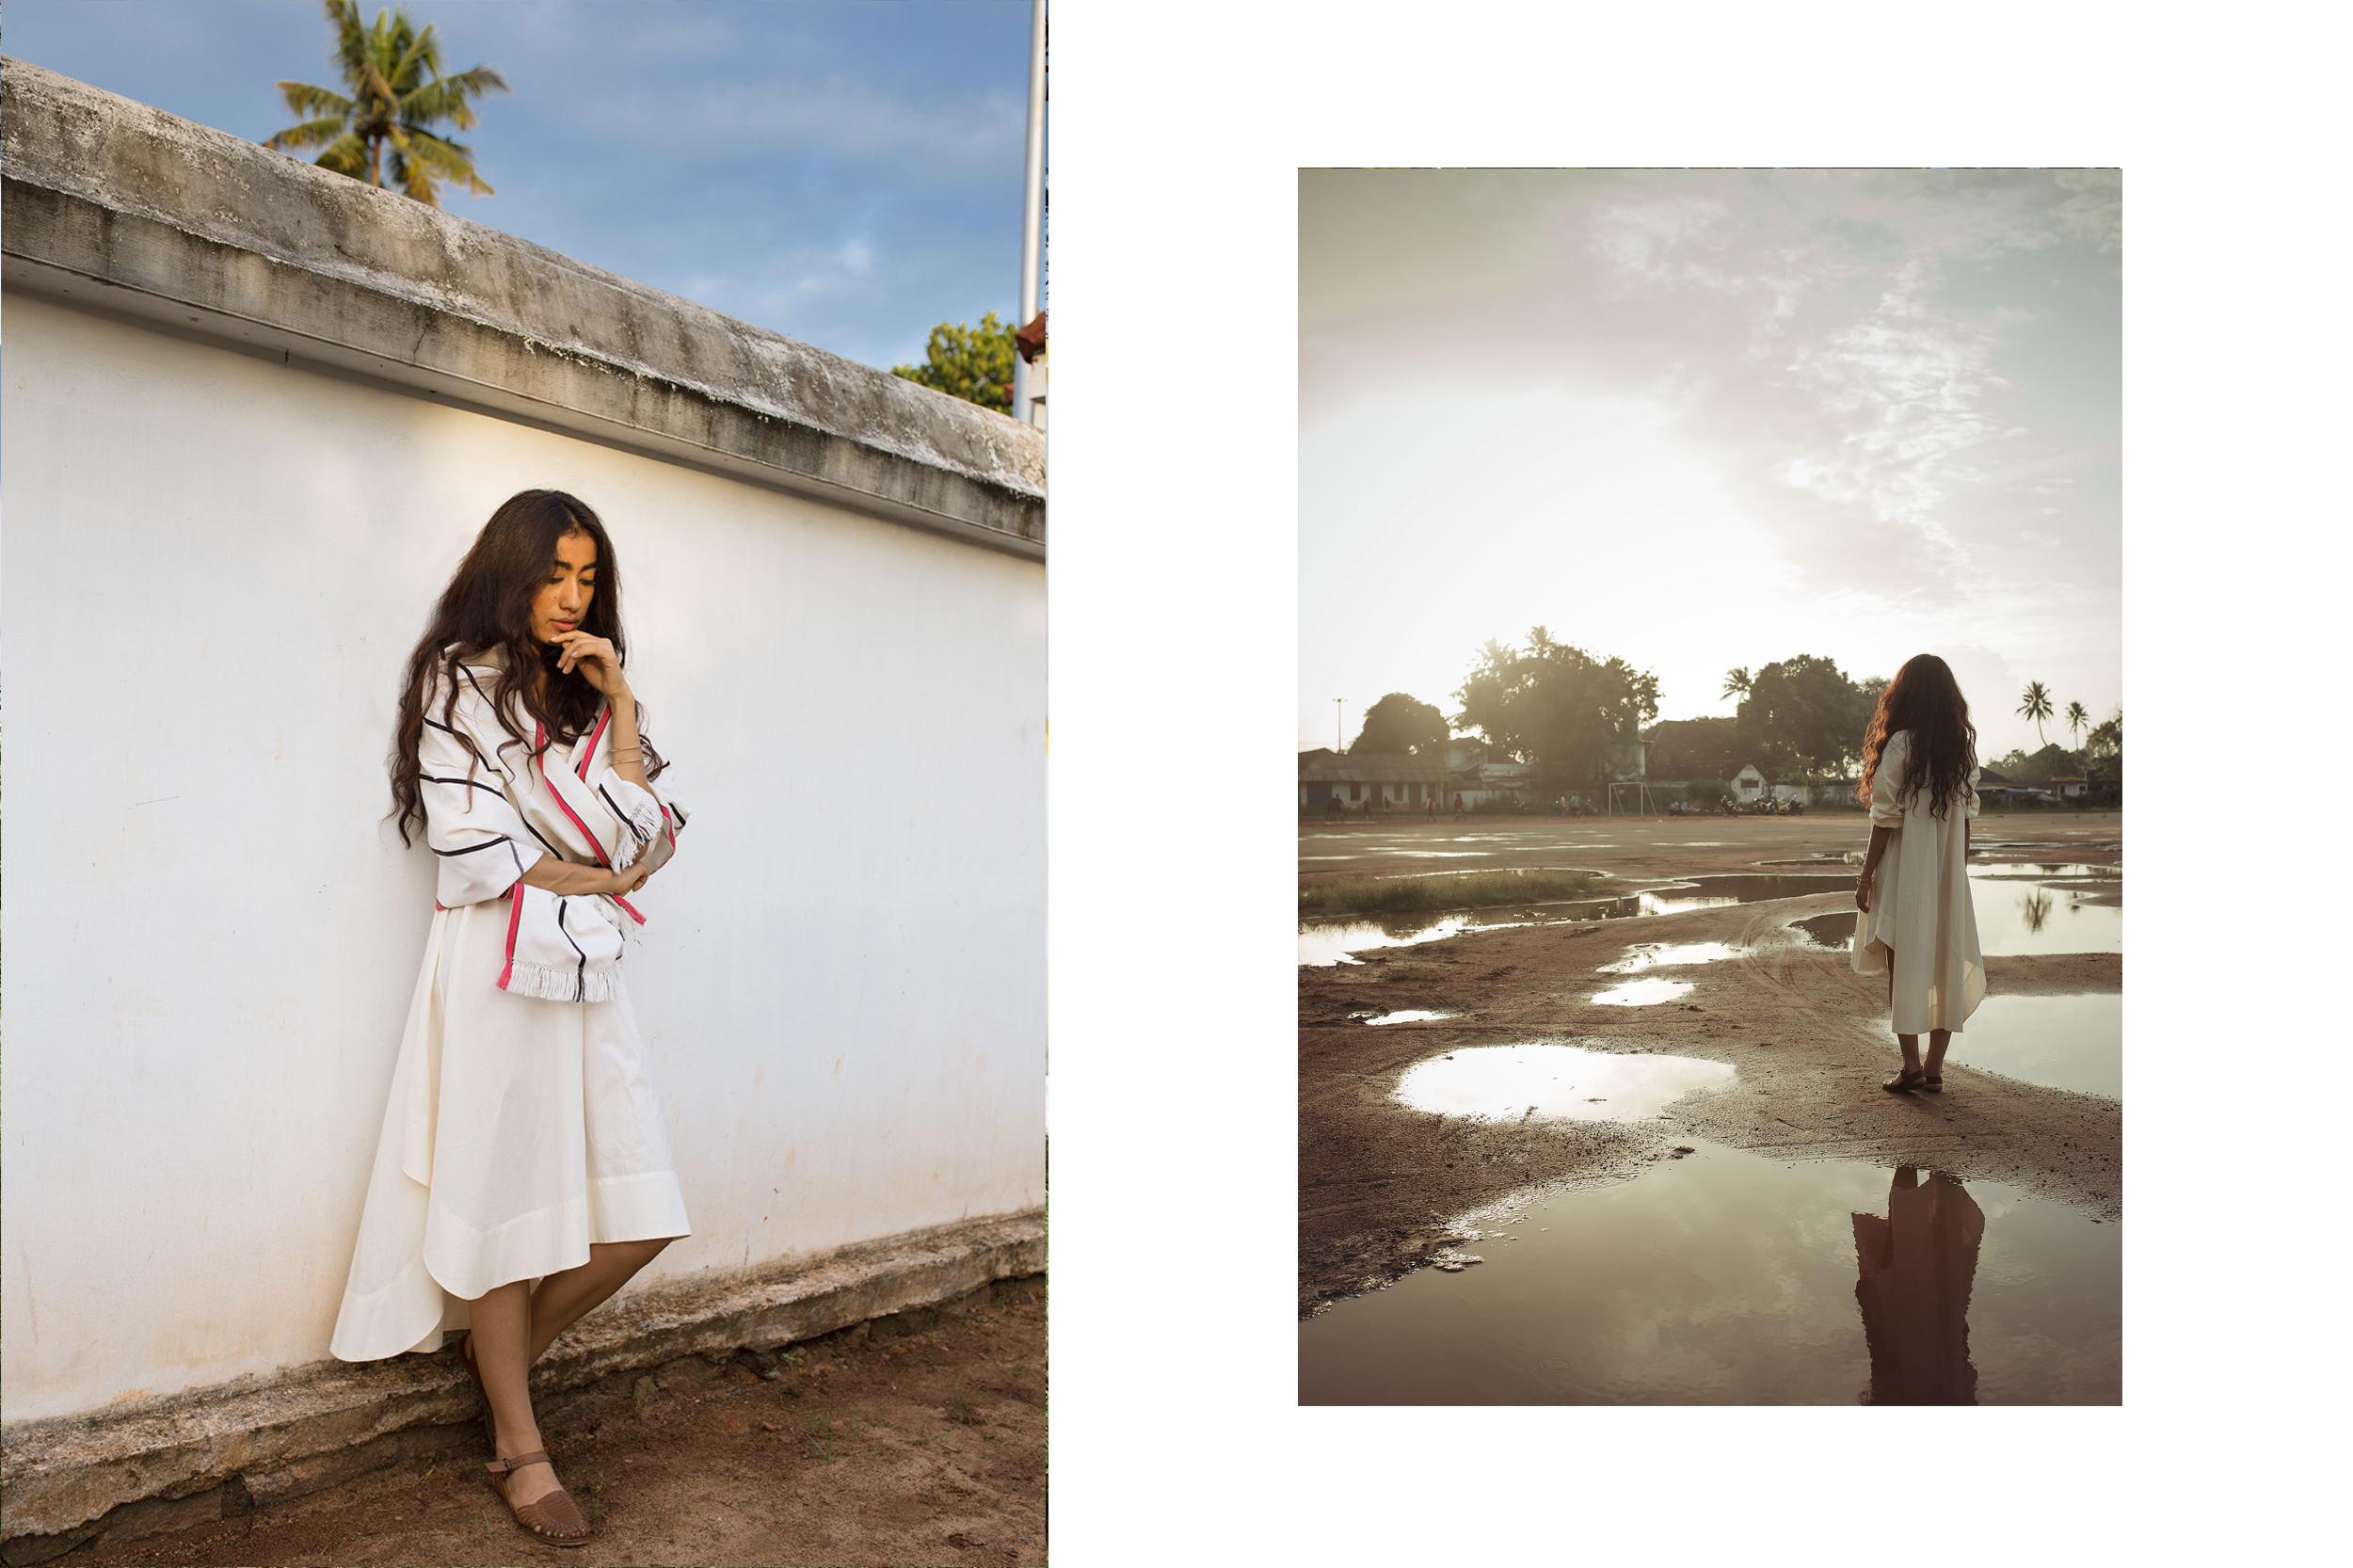 Sindhur_Photography_Fashion_Gloria tep_21.jpg